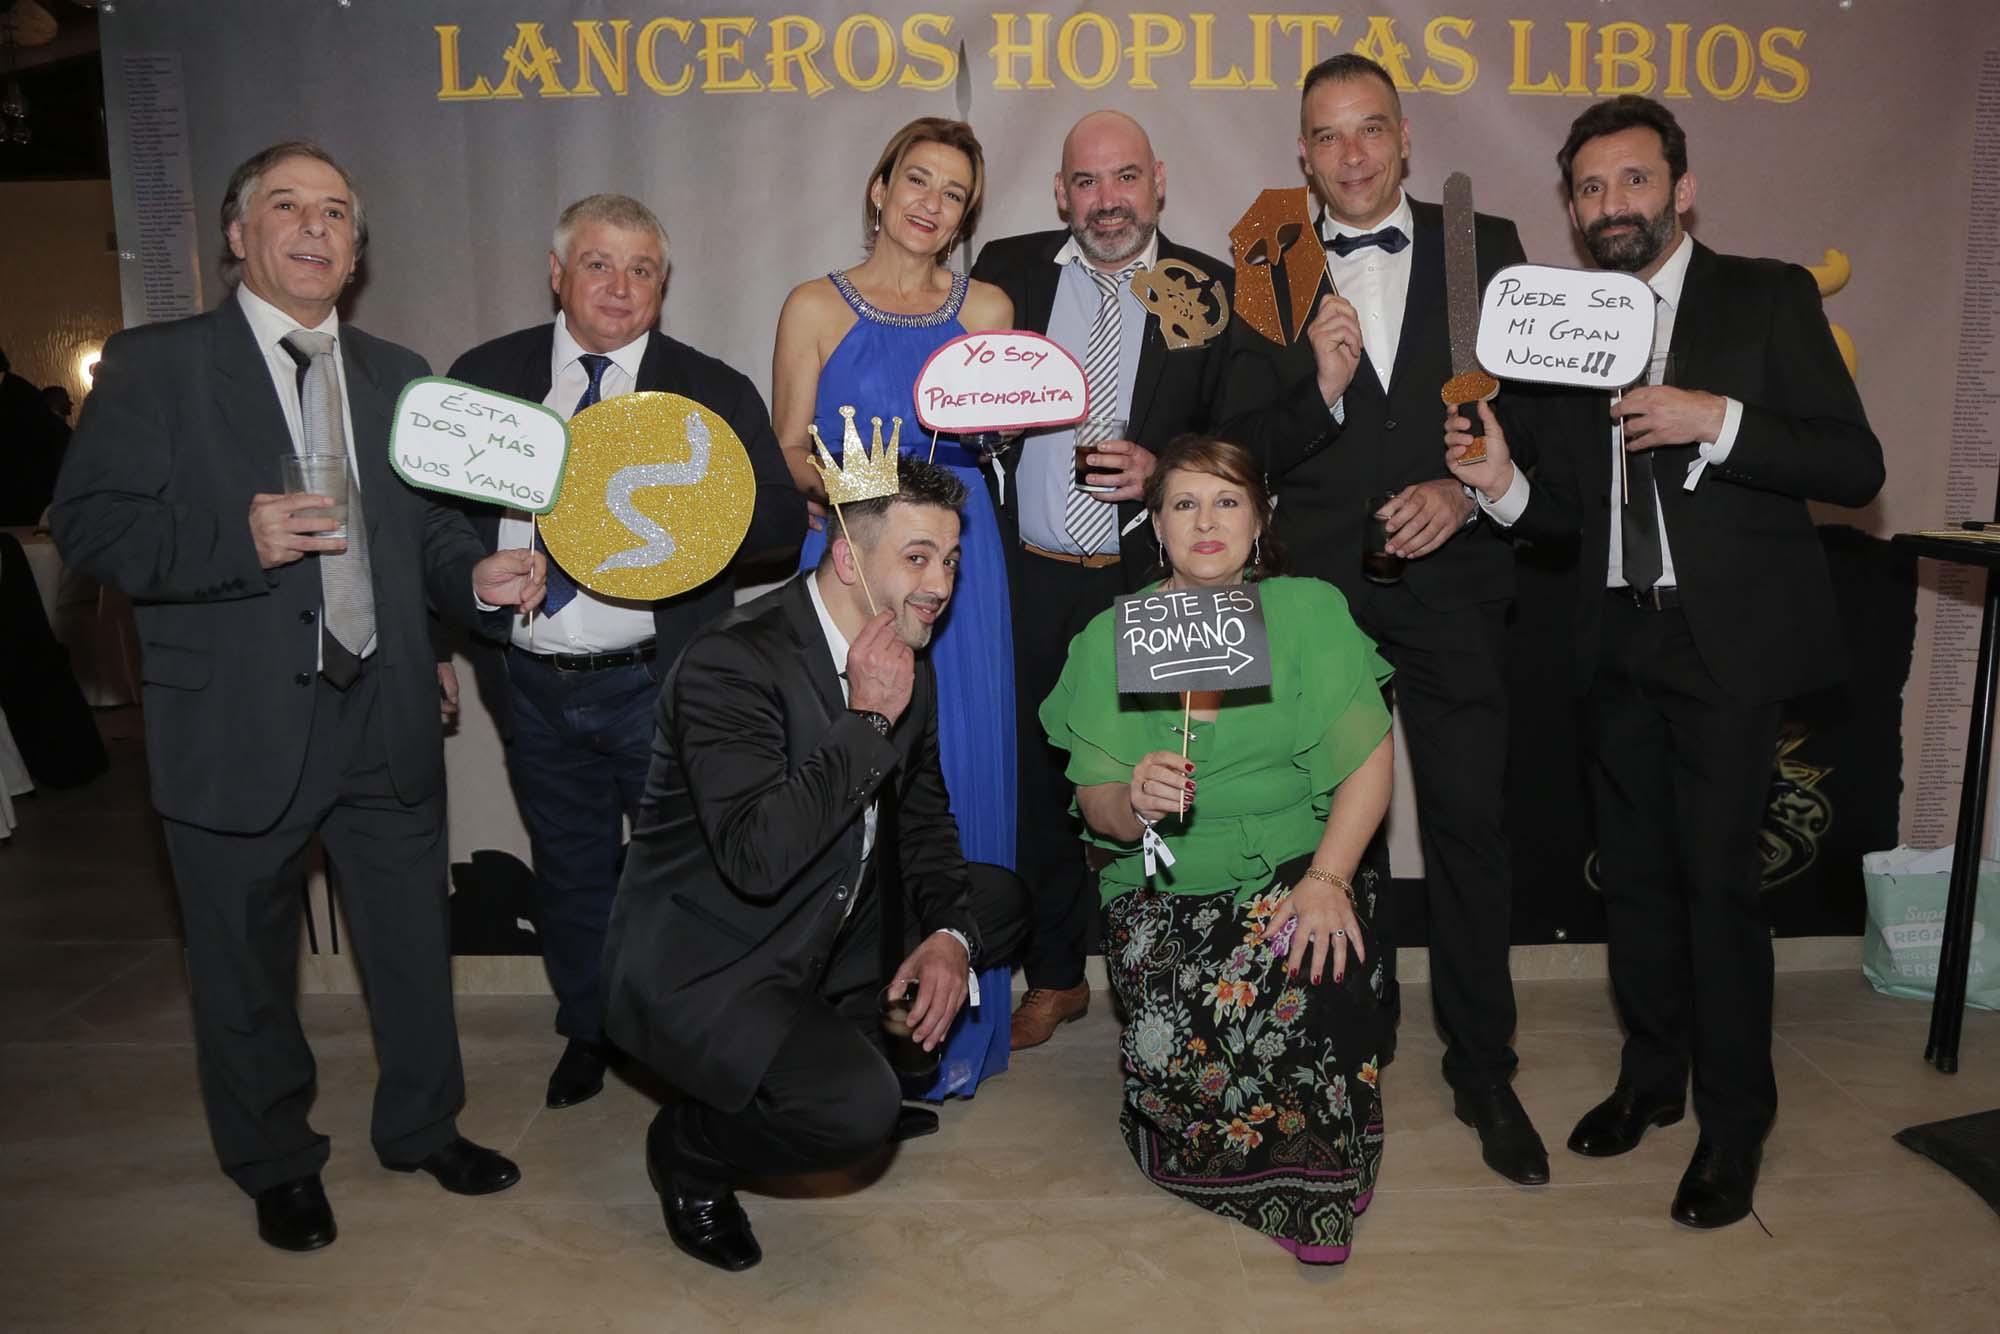 Lanceros Hoplitas Libios  (185)